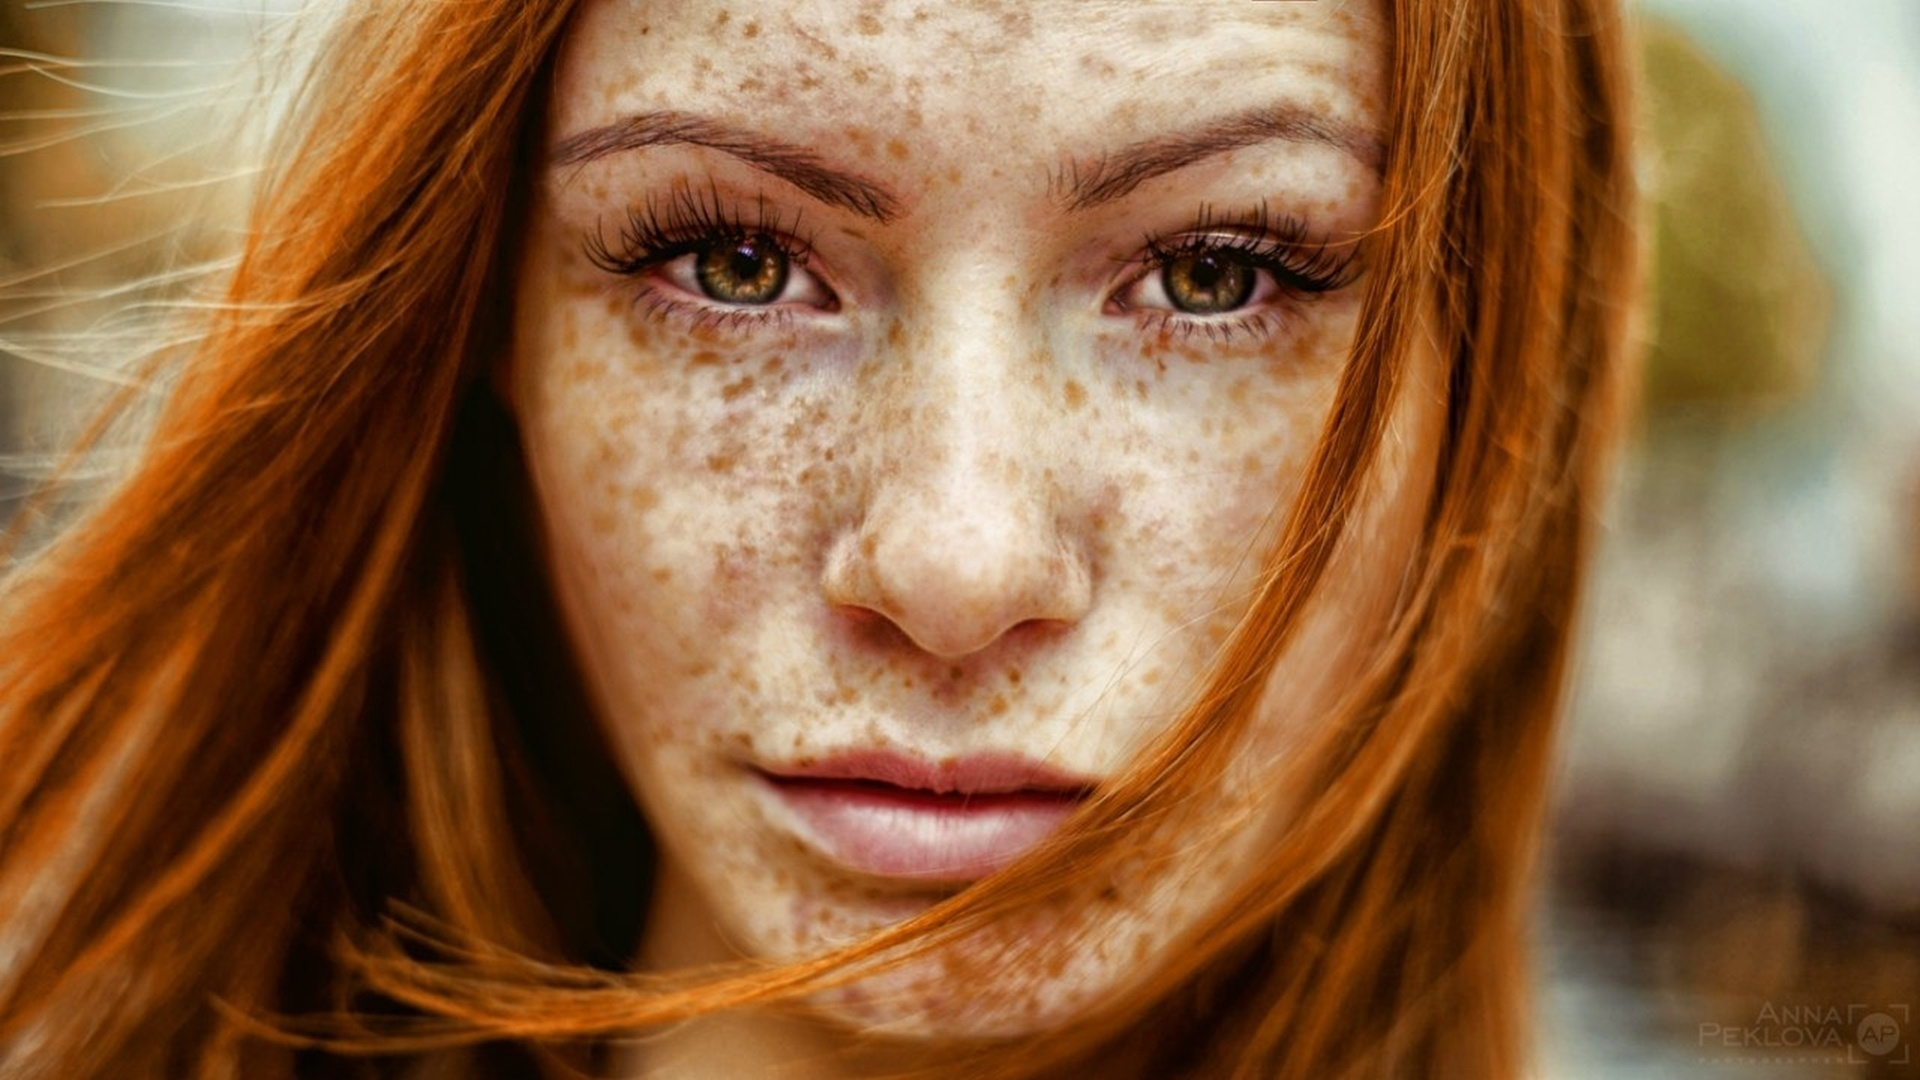 Freckled Girls HD Wallpaper